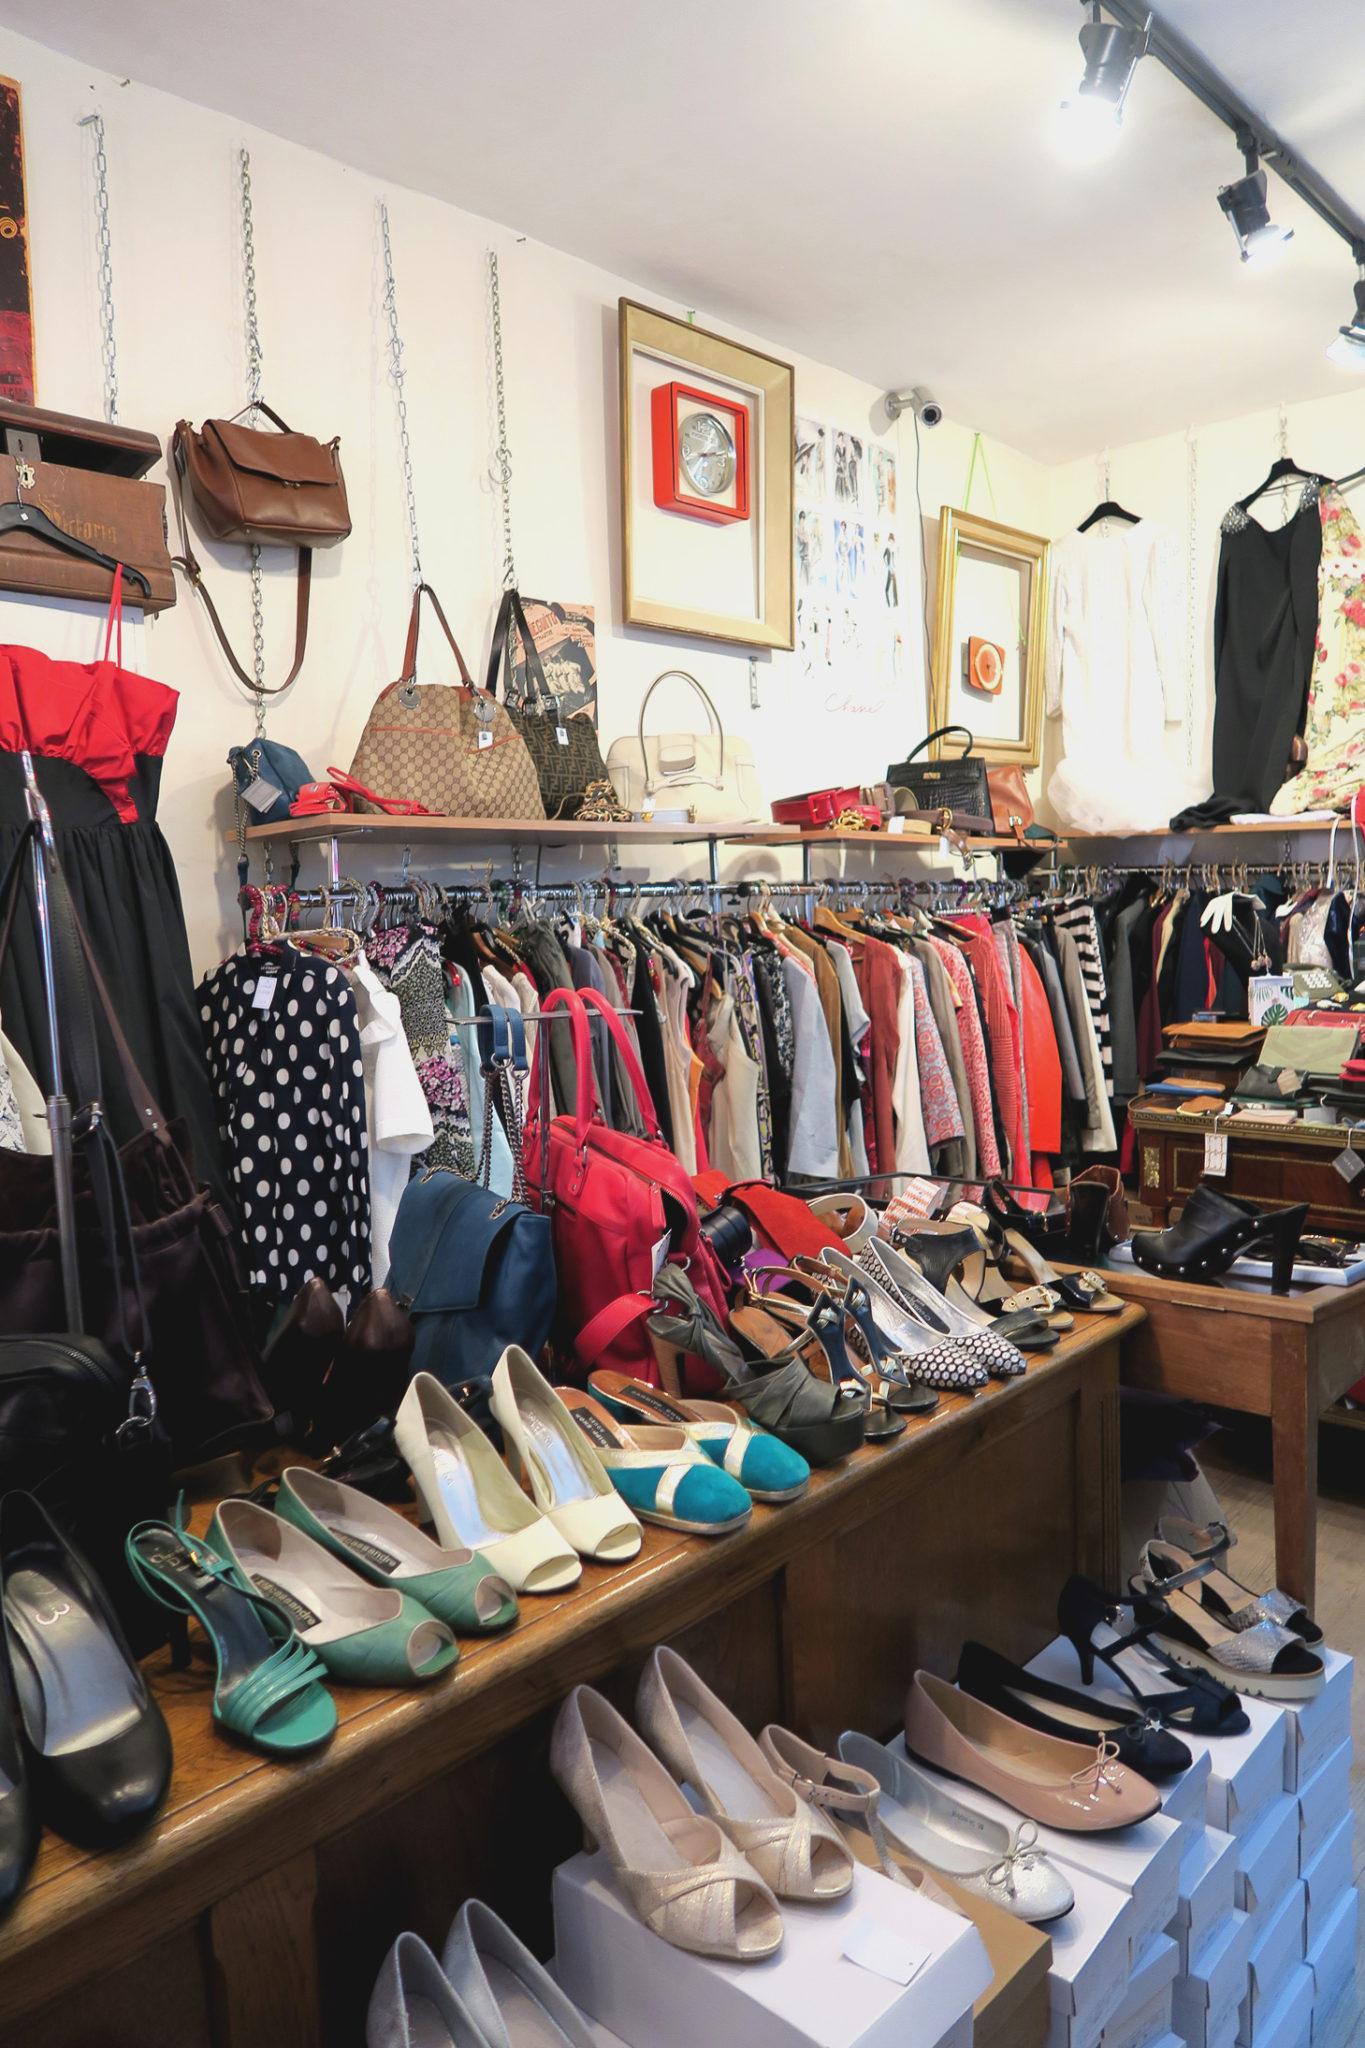 Hema_Balade_friperies_paris_vintage_77_boutique